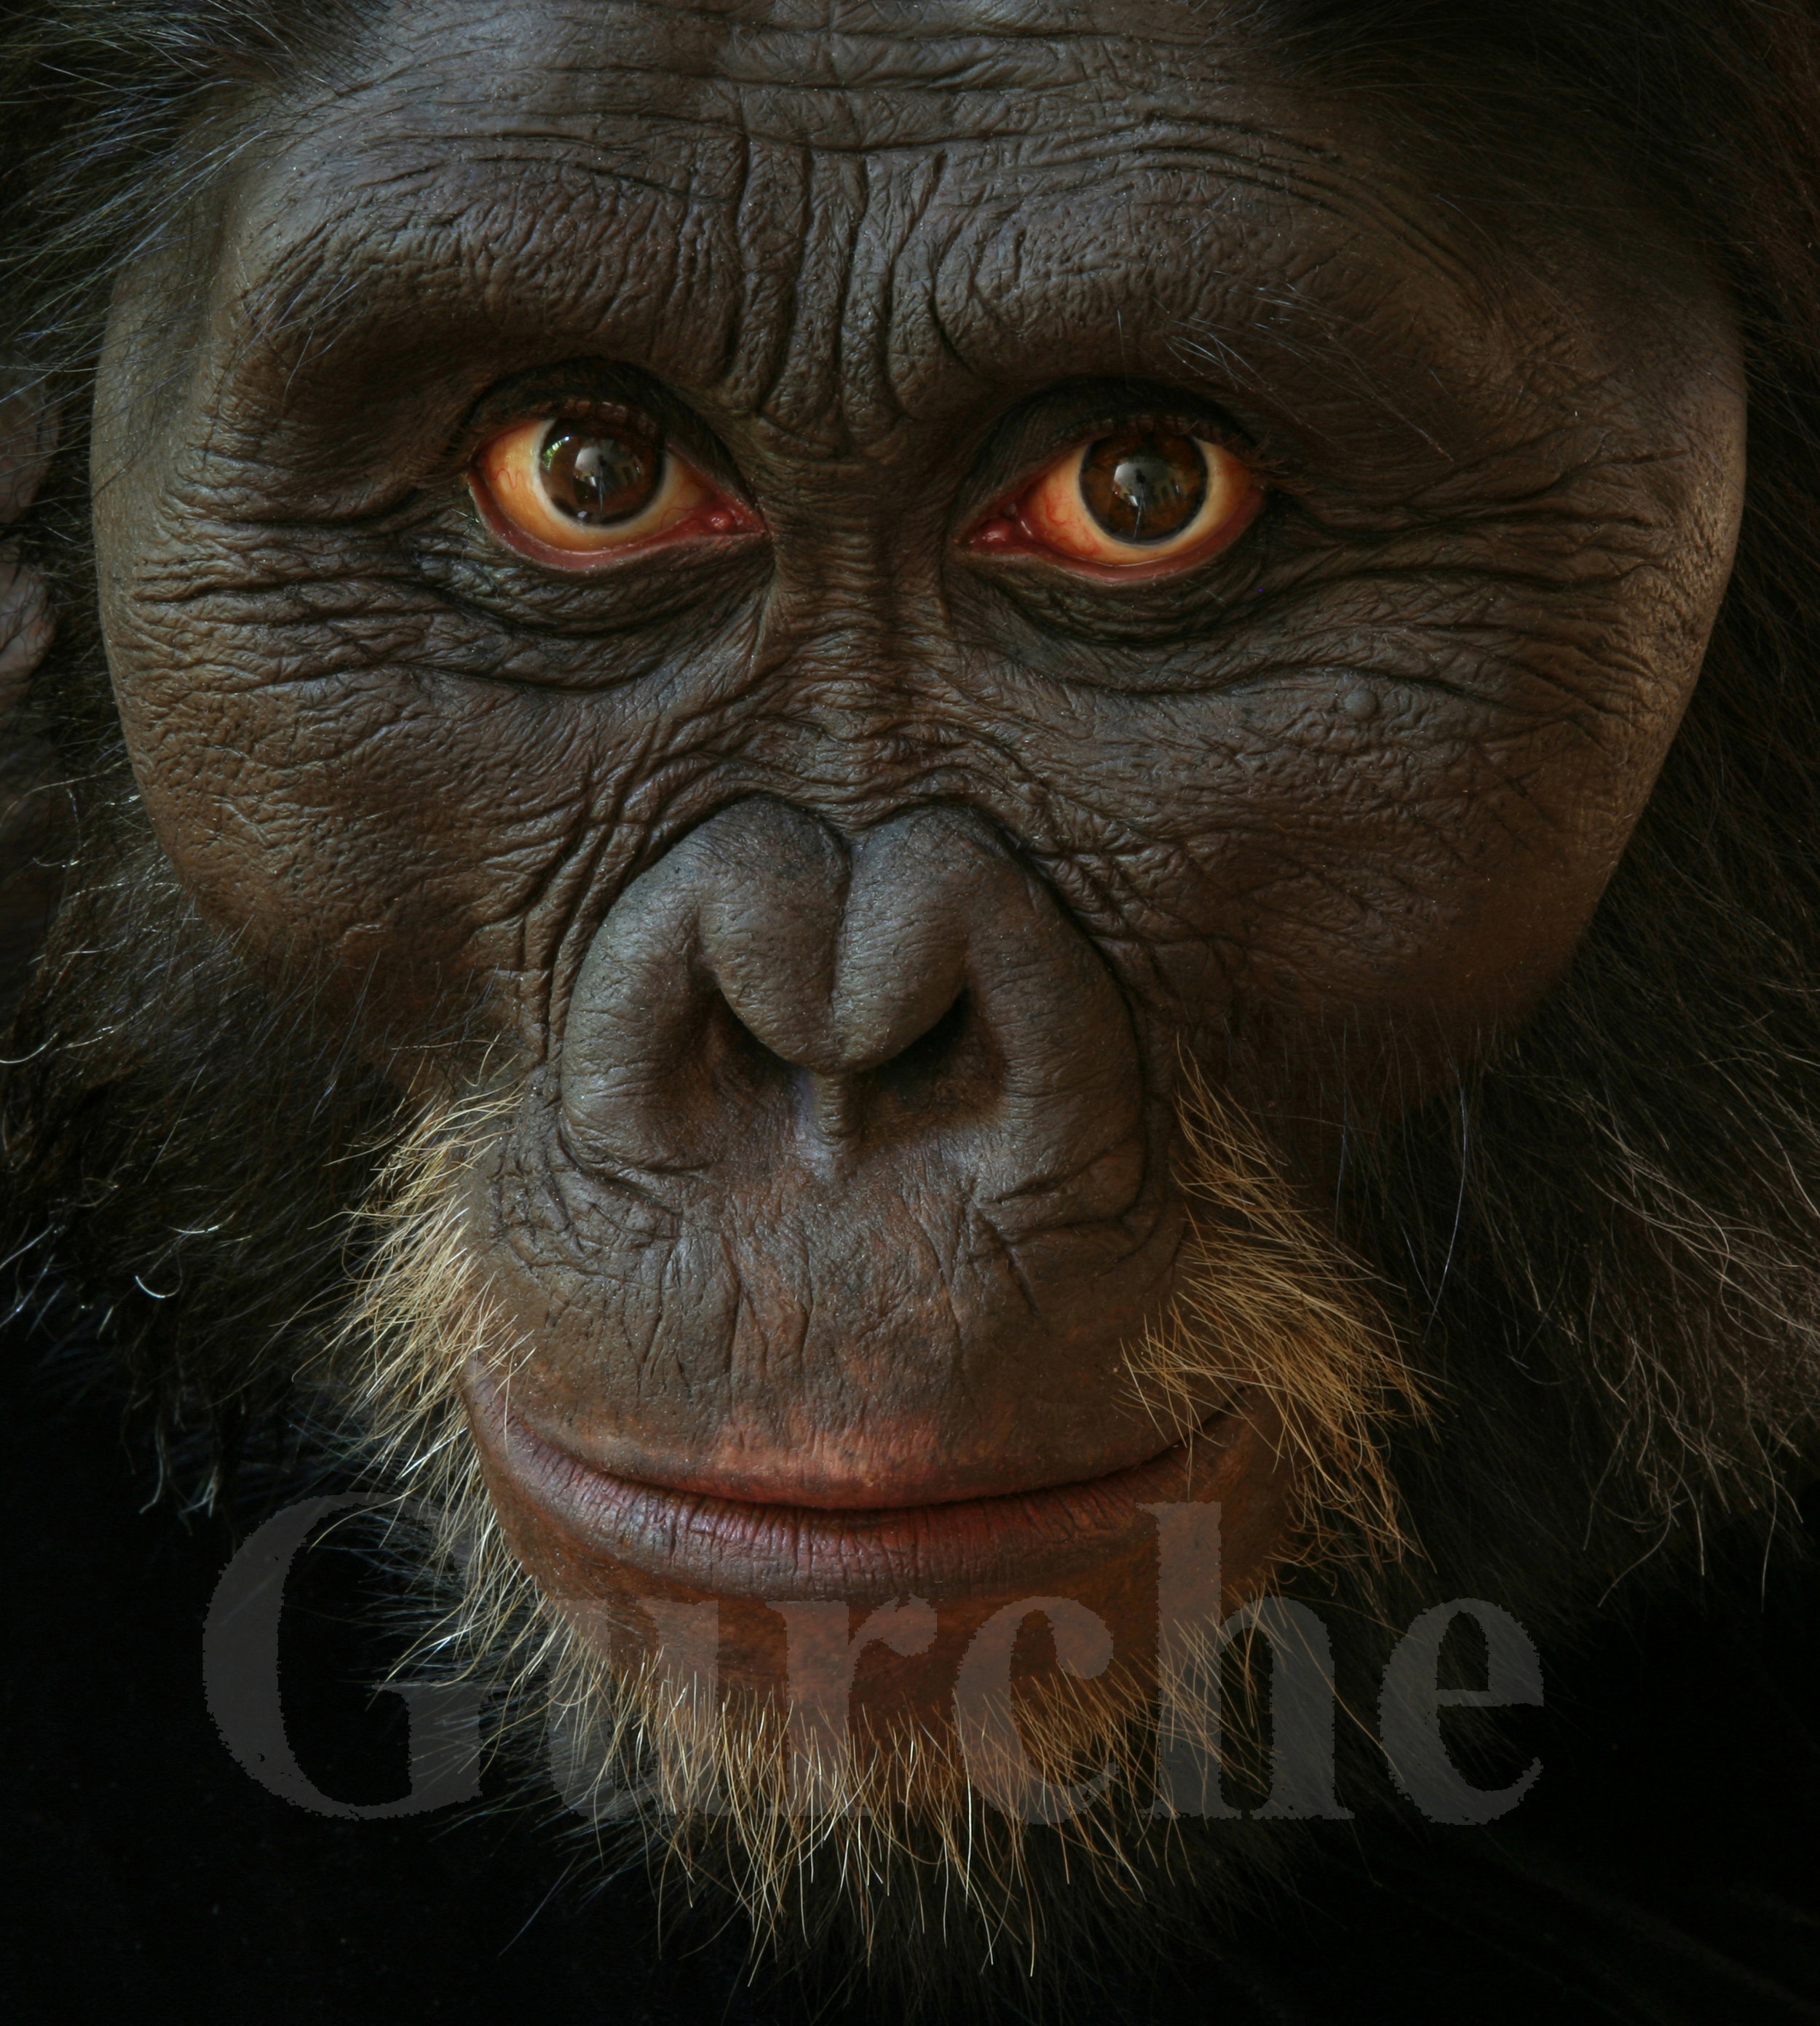 Img 980 Australopithecus afarensis male based on AL 444 skull.jpg